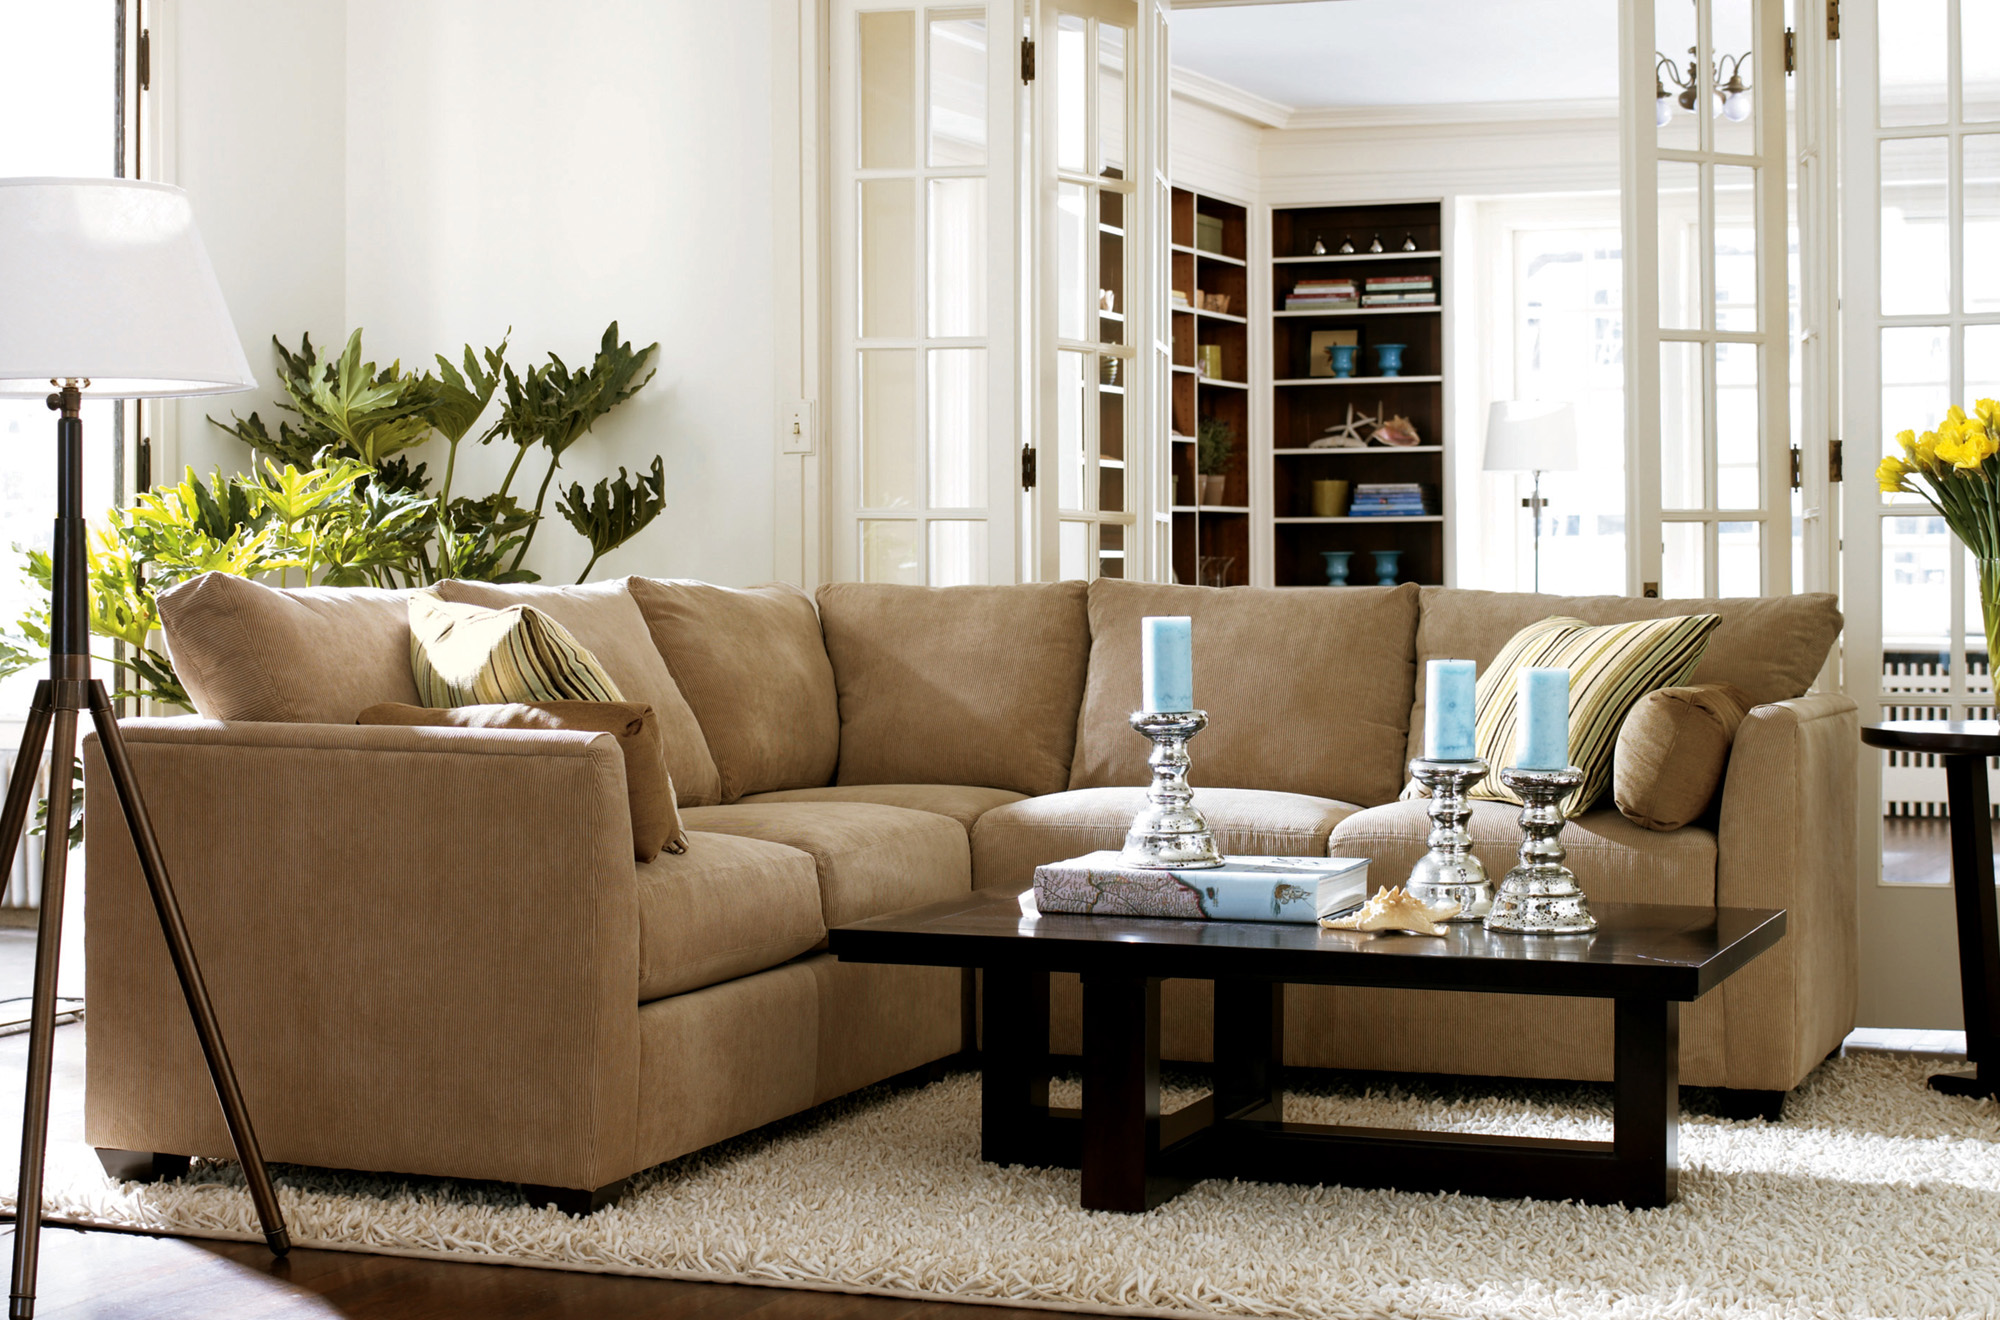 Concepts Horizon Sectional Sofa Furniture De